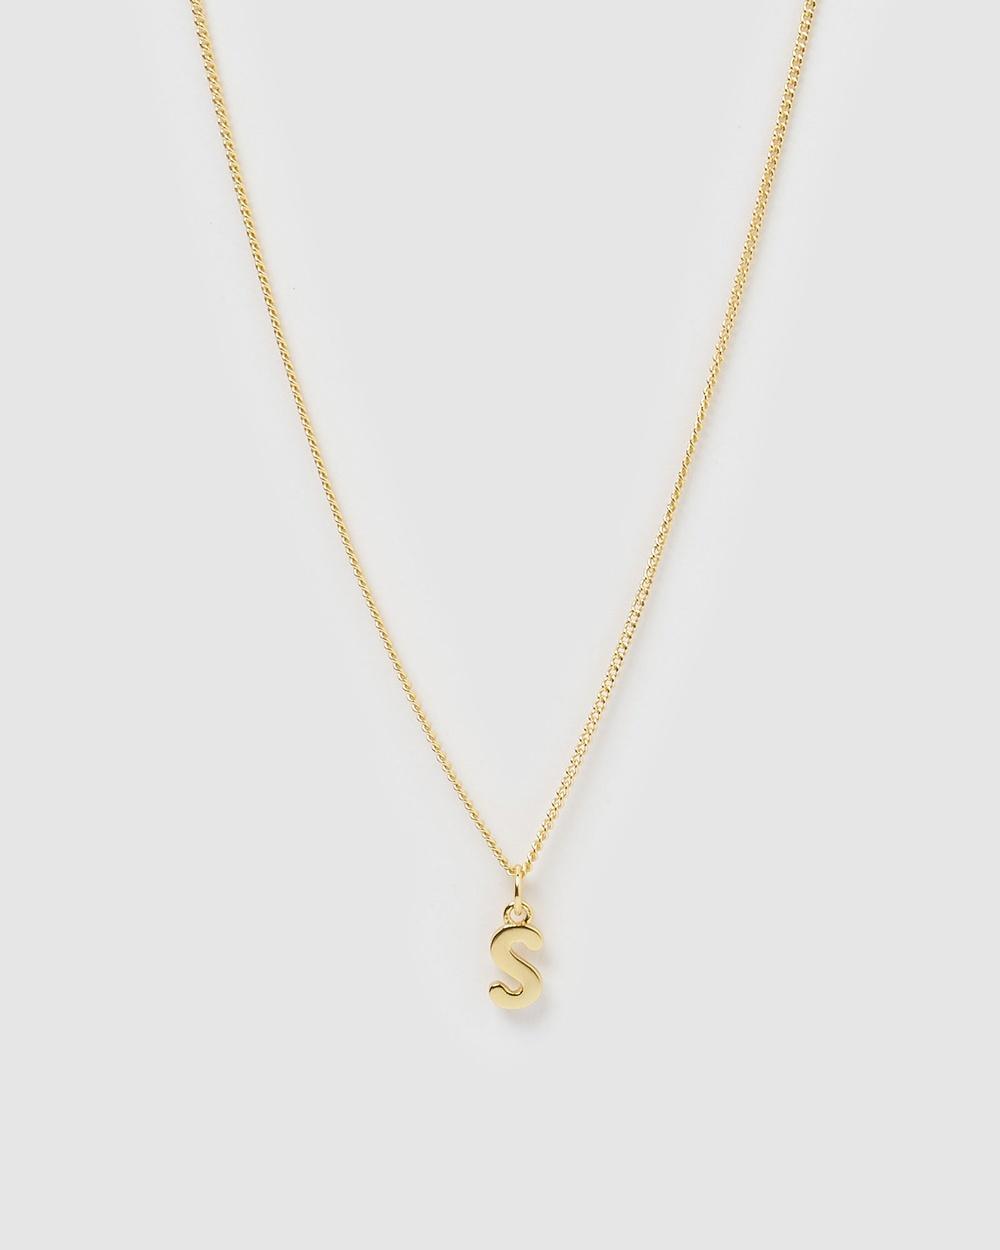 Izoa Alphabet Letter S Necklace Jewellery Gold